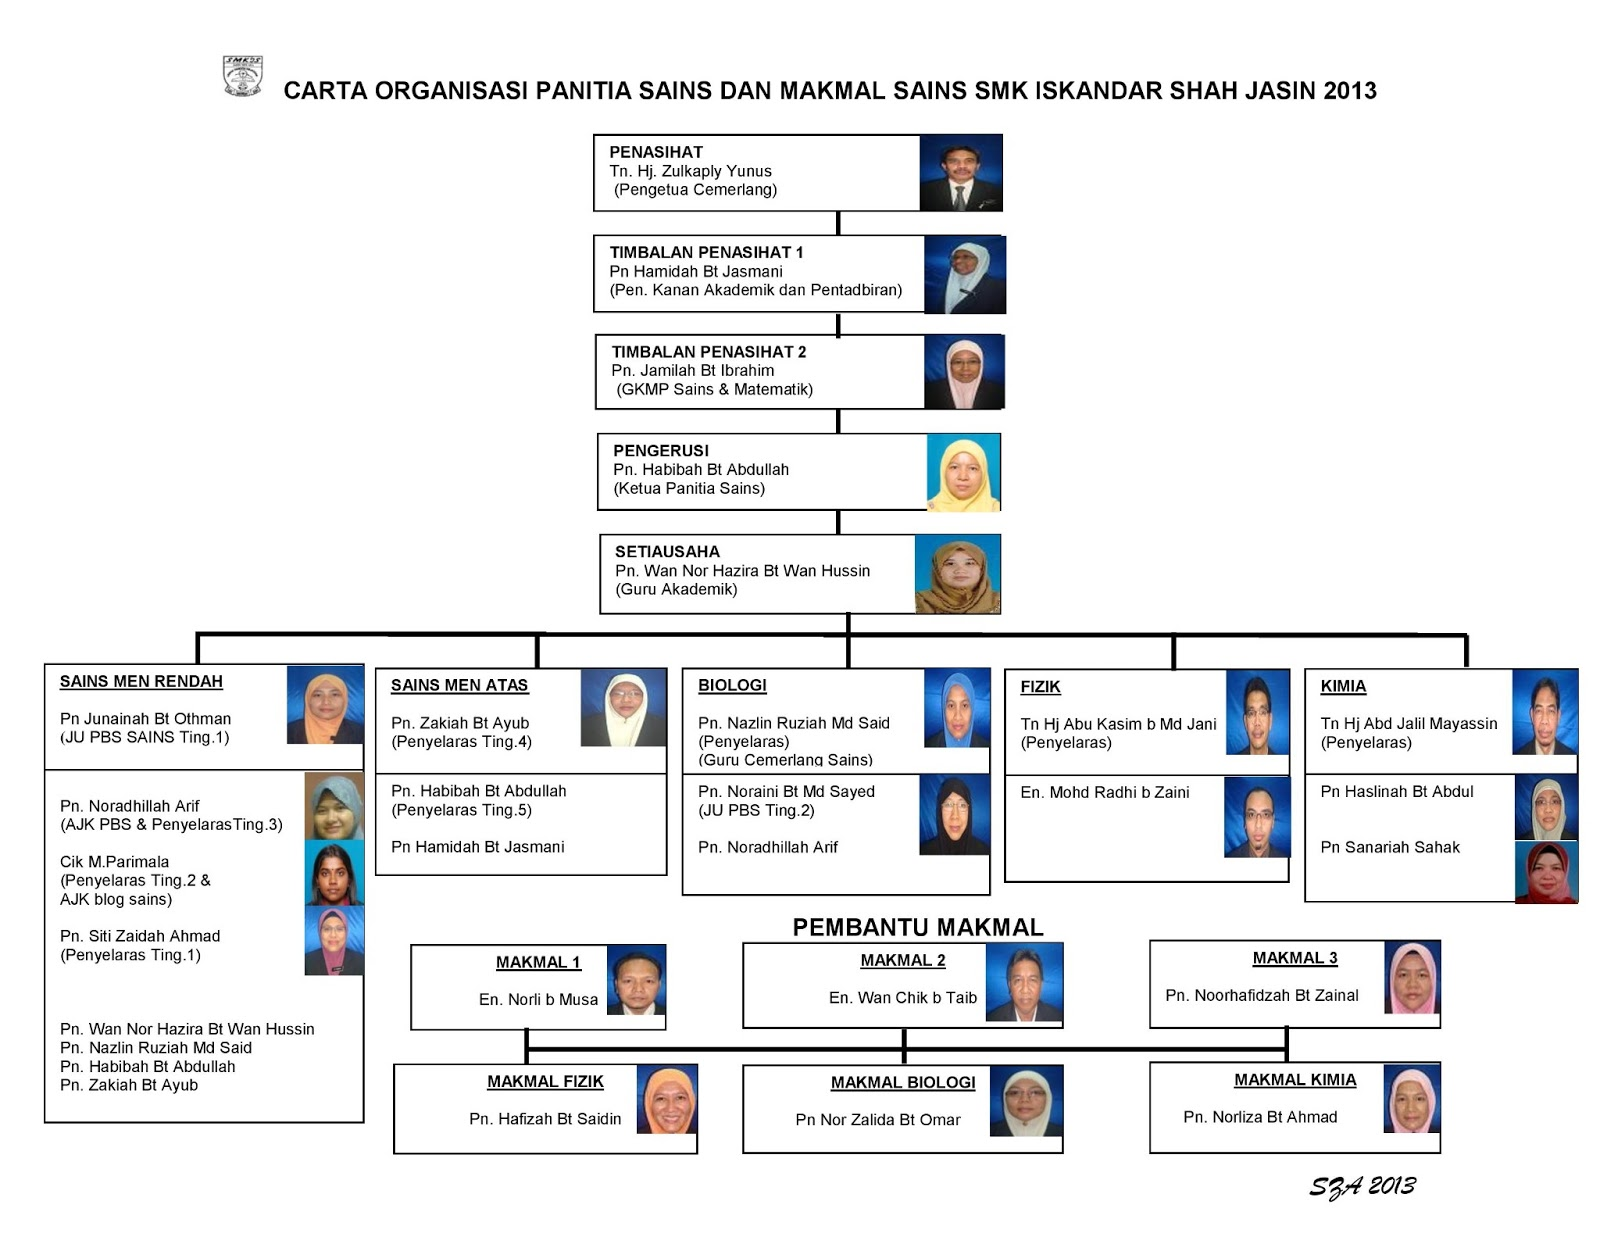 _organisasi_panitia_sains_dan_makmal_sains_smkis_2013-page-001.jpg